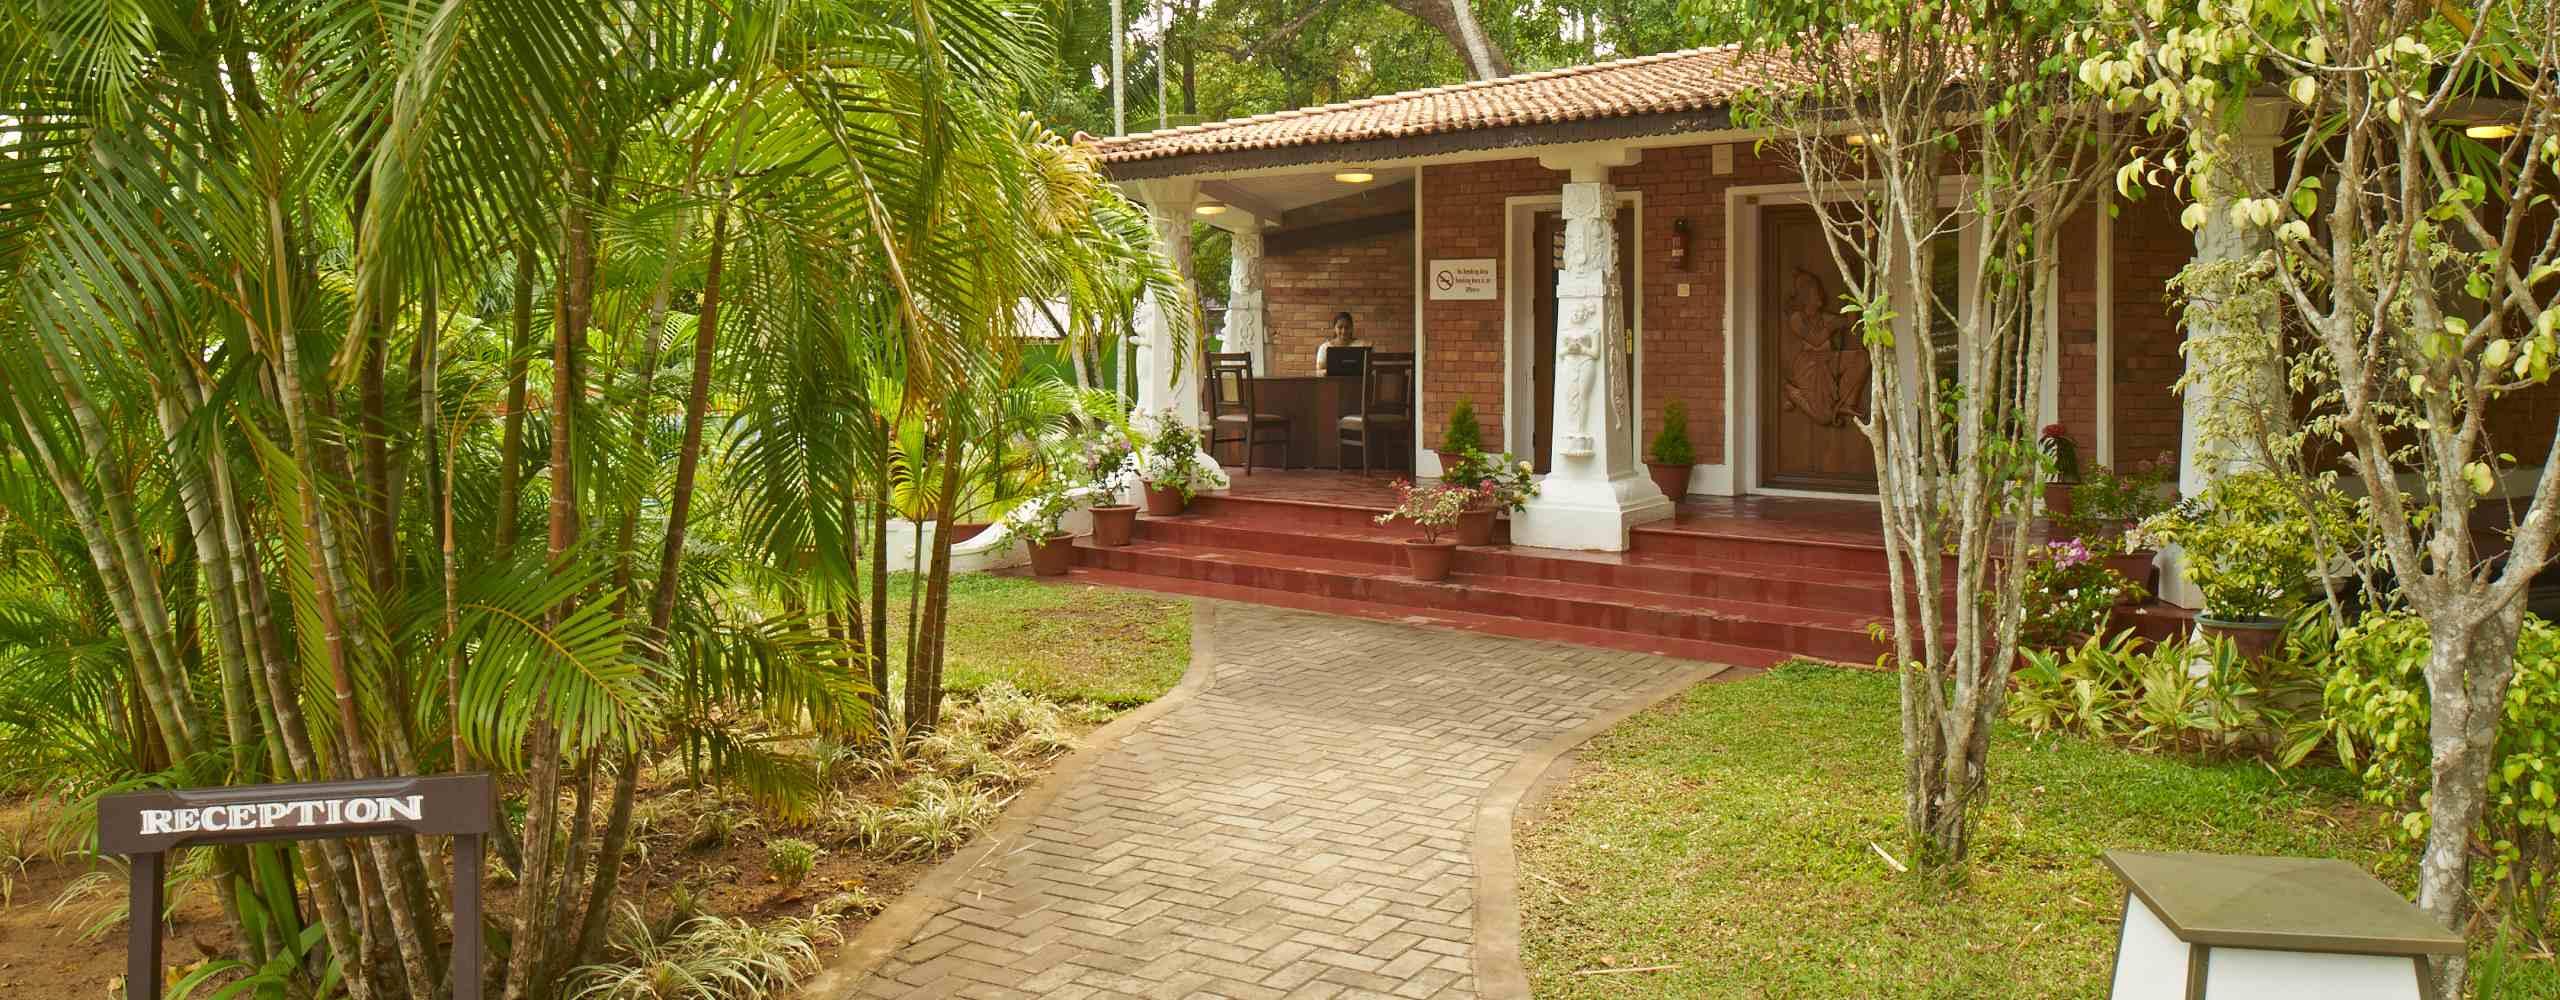 Club Mahindra Ashtamudi Kerala Reviews Resort Booking